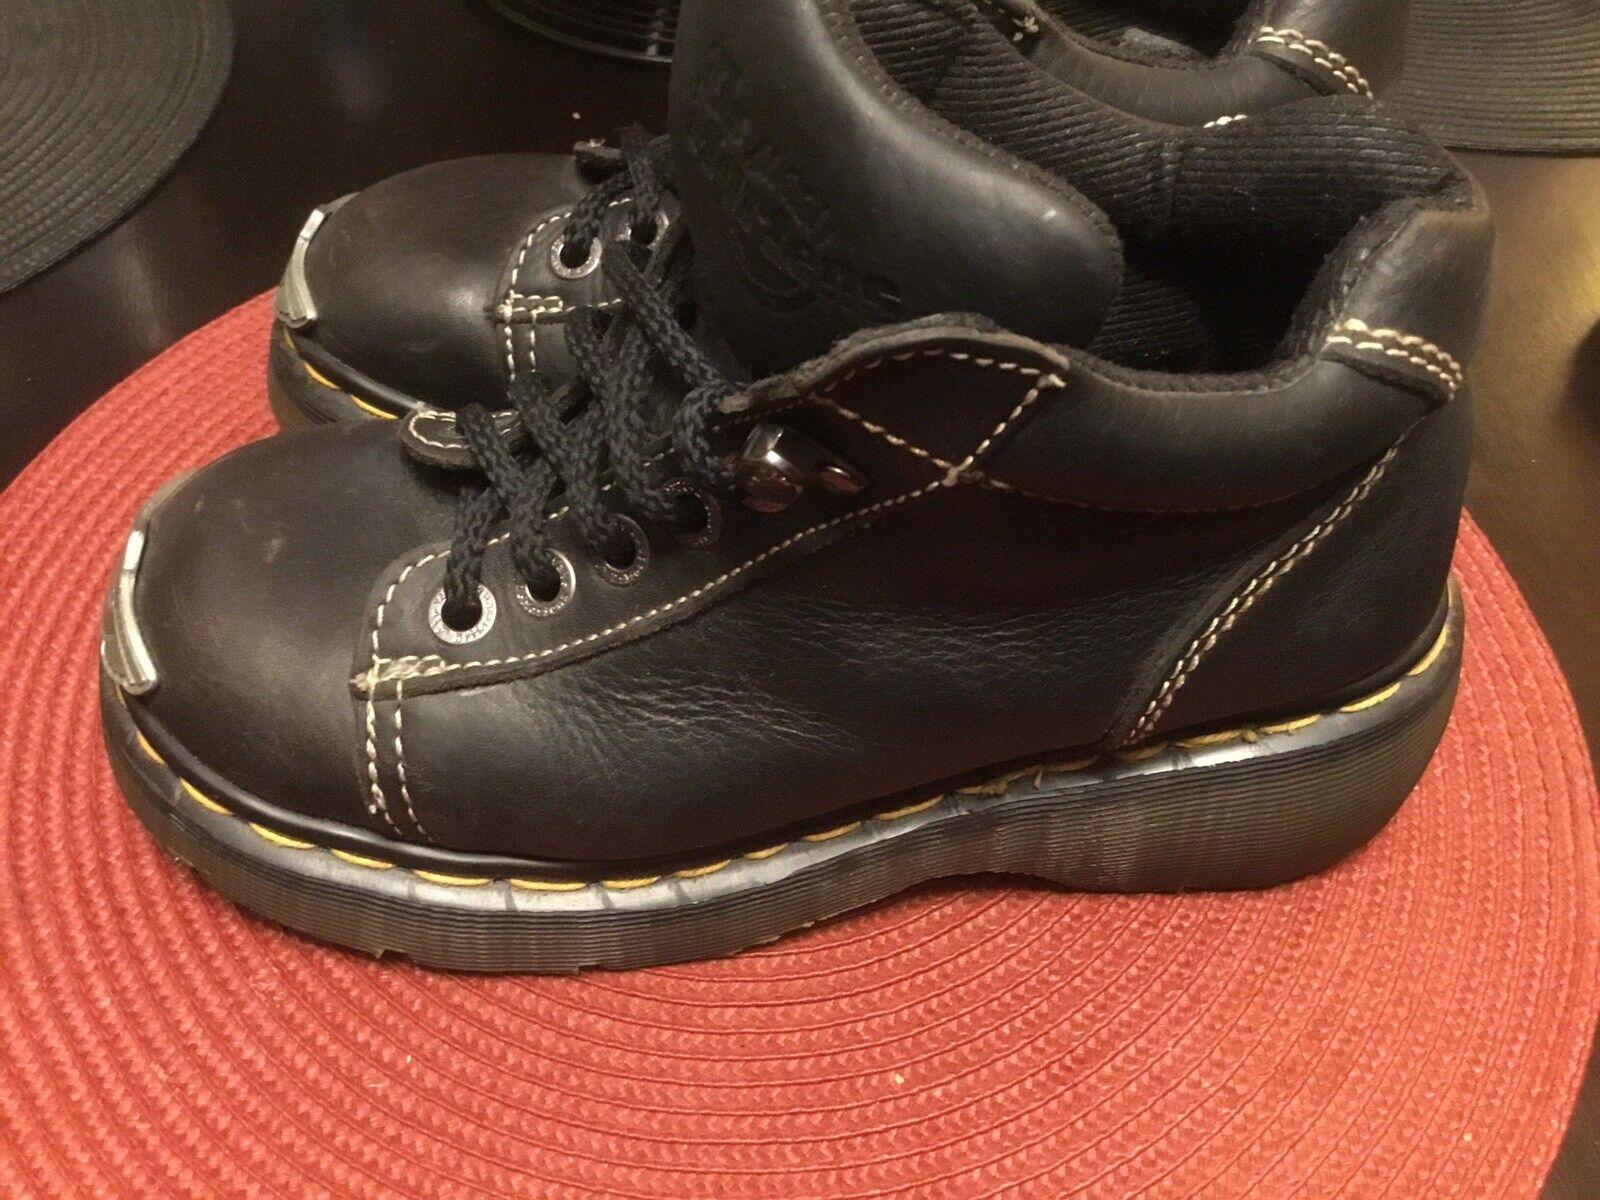 DR. MARTENS Women's Ankle Boots Harley Davidson 8542 Black Leather Size 5 US